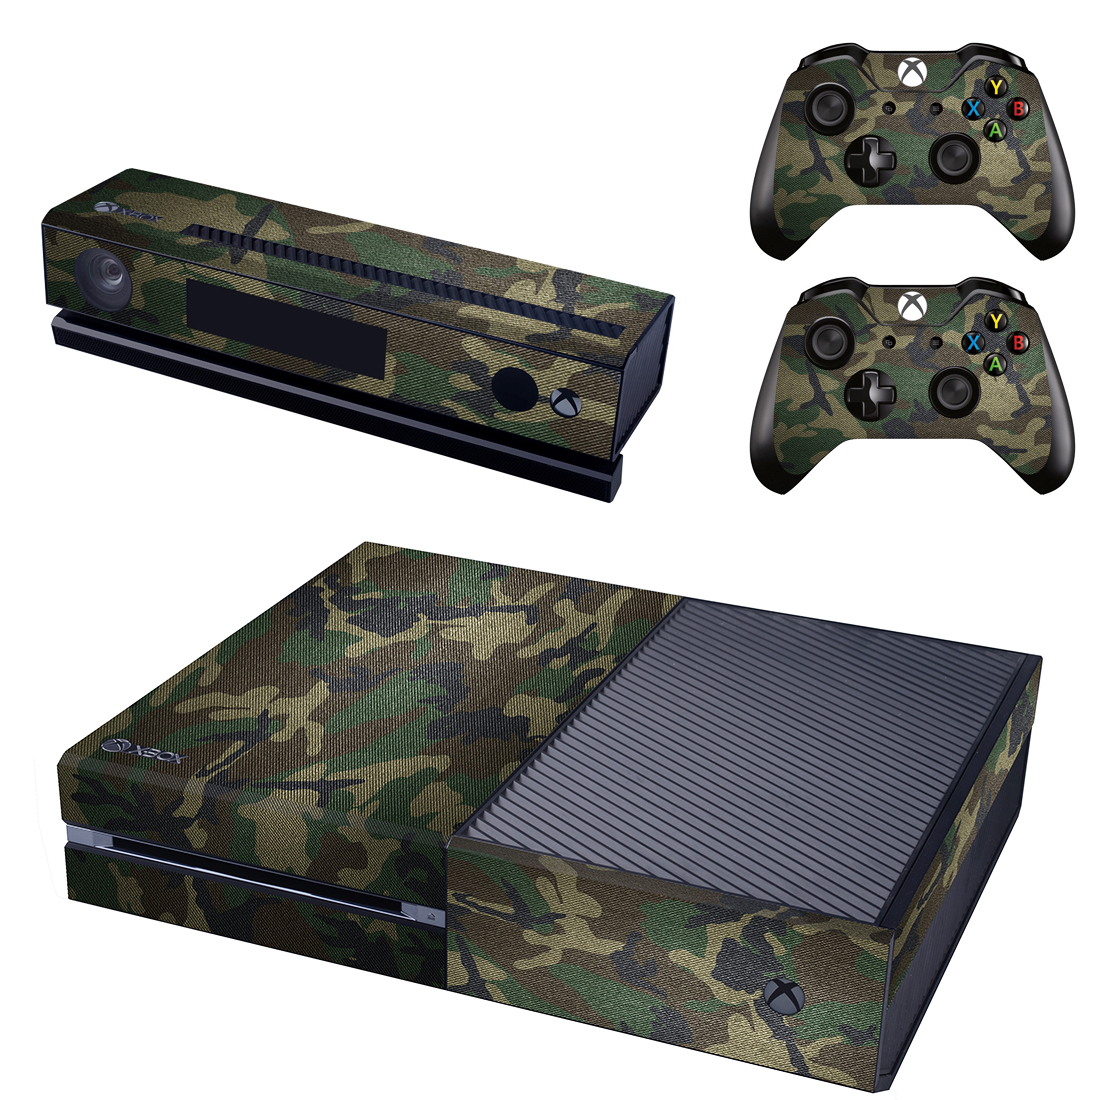 [reytid] Xbox One Console Skin / Sticker + 2 X Controller Decals & Kinect Wrap - Army Camo